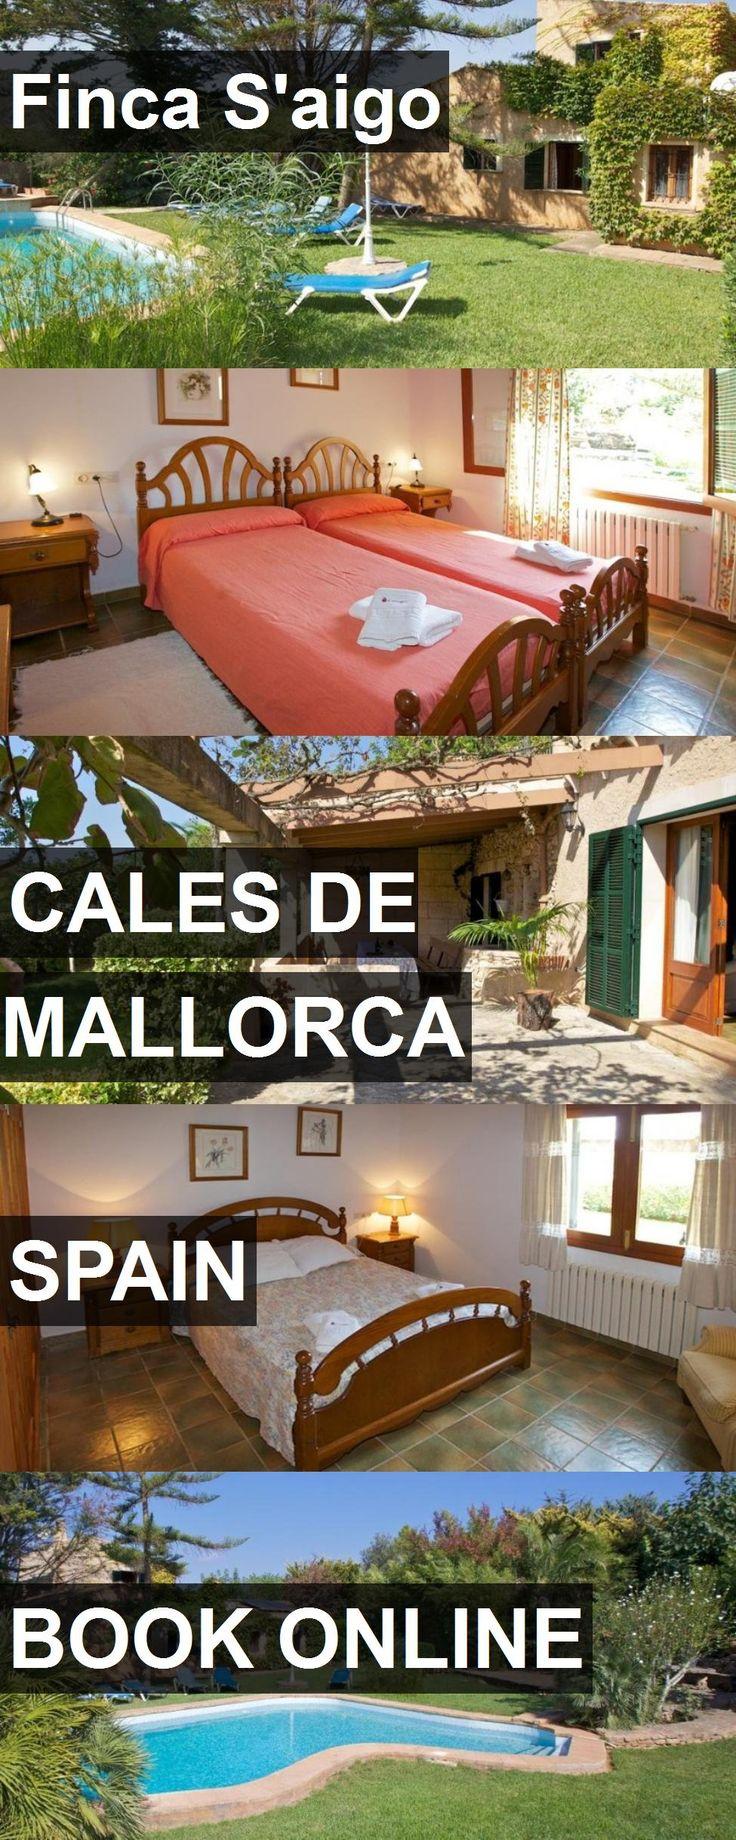 Hotel Finca S'aigo in Cales de Mallorca, Spain. For more information, photos, reviews and best prices please follow the link. #Spain #CalesdeMallorca #hotel #travel #vacation